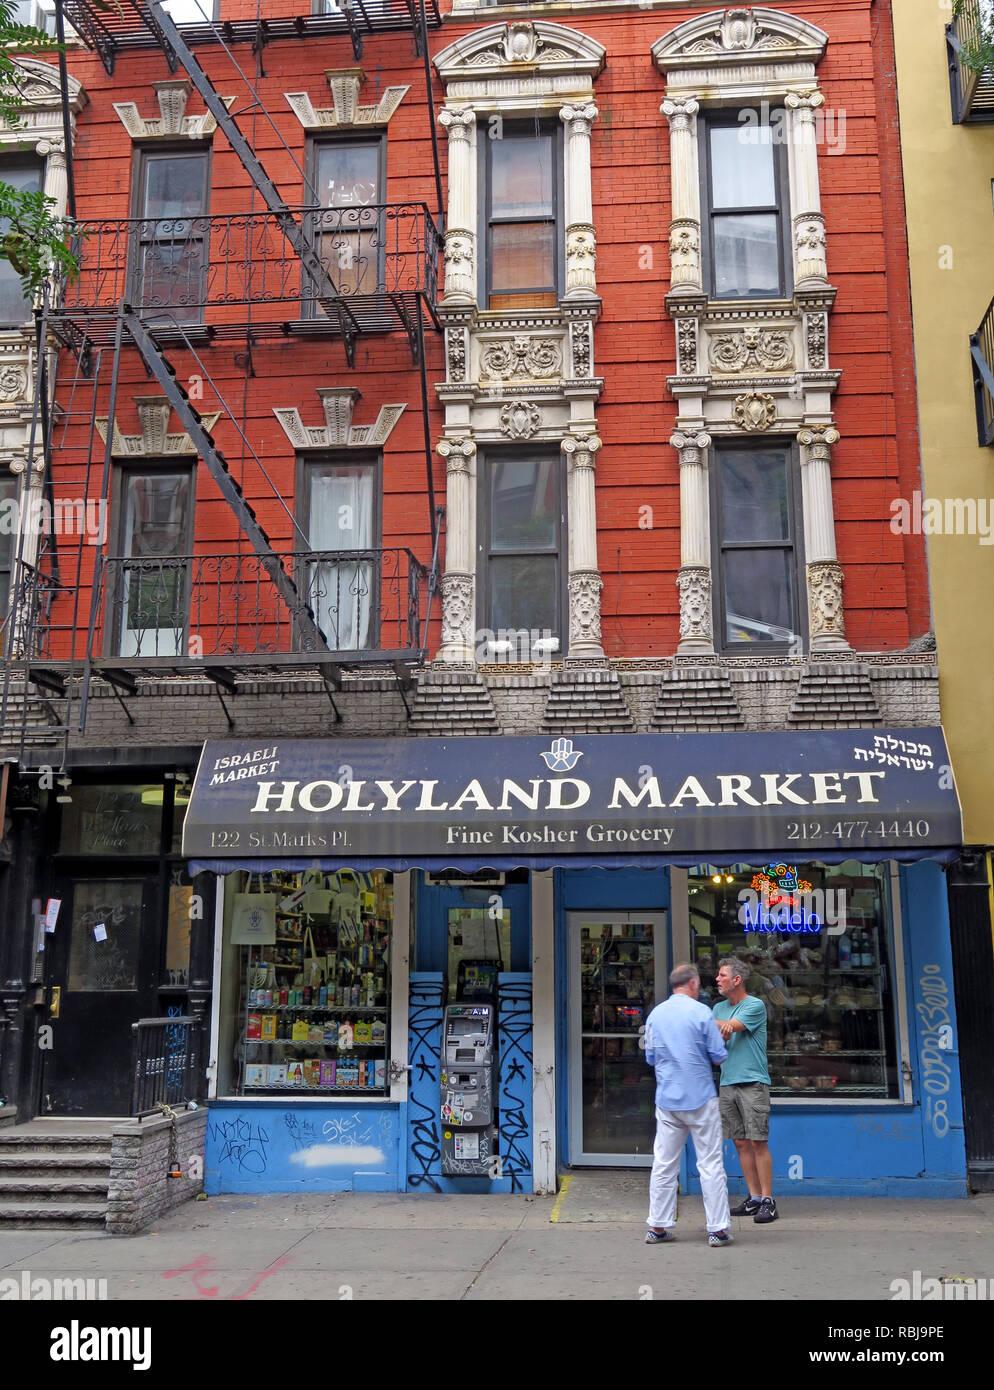 @HotpixUK,HotpixUK,GoTonySmith,NY,NYC,New York,City,Centre,street,USA,United states of America,United States,East Village,art,Manhattan,deli,talking,grocery,NewYork